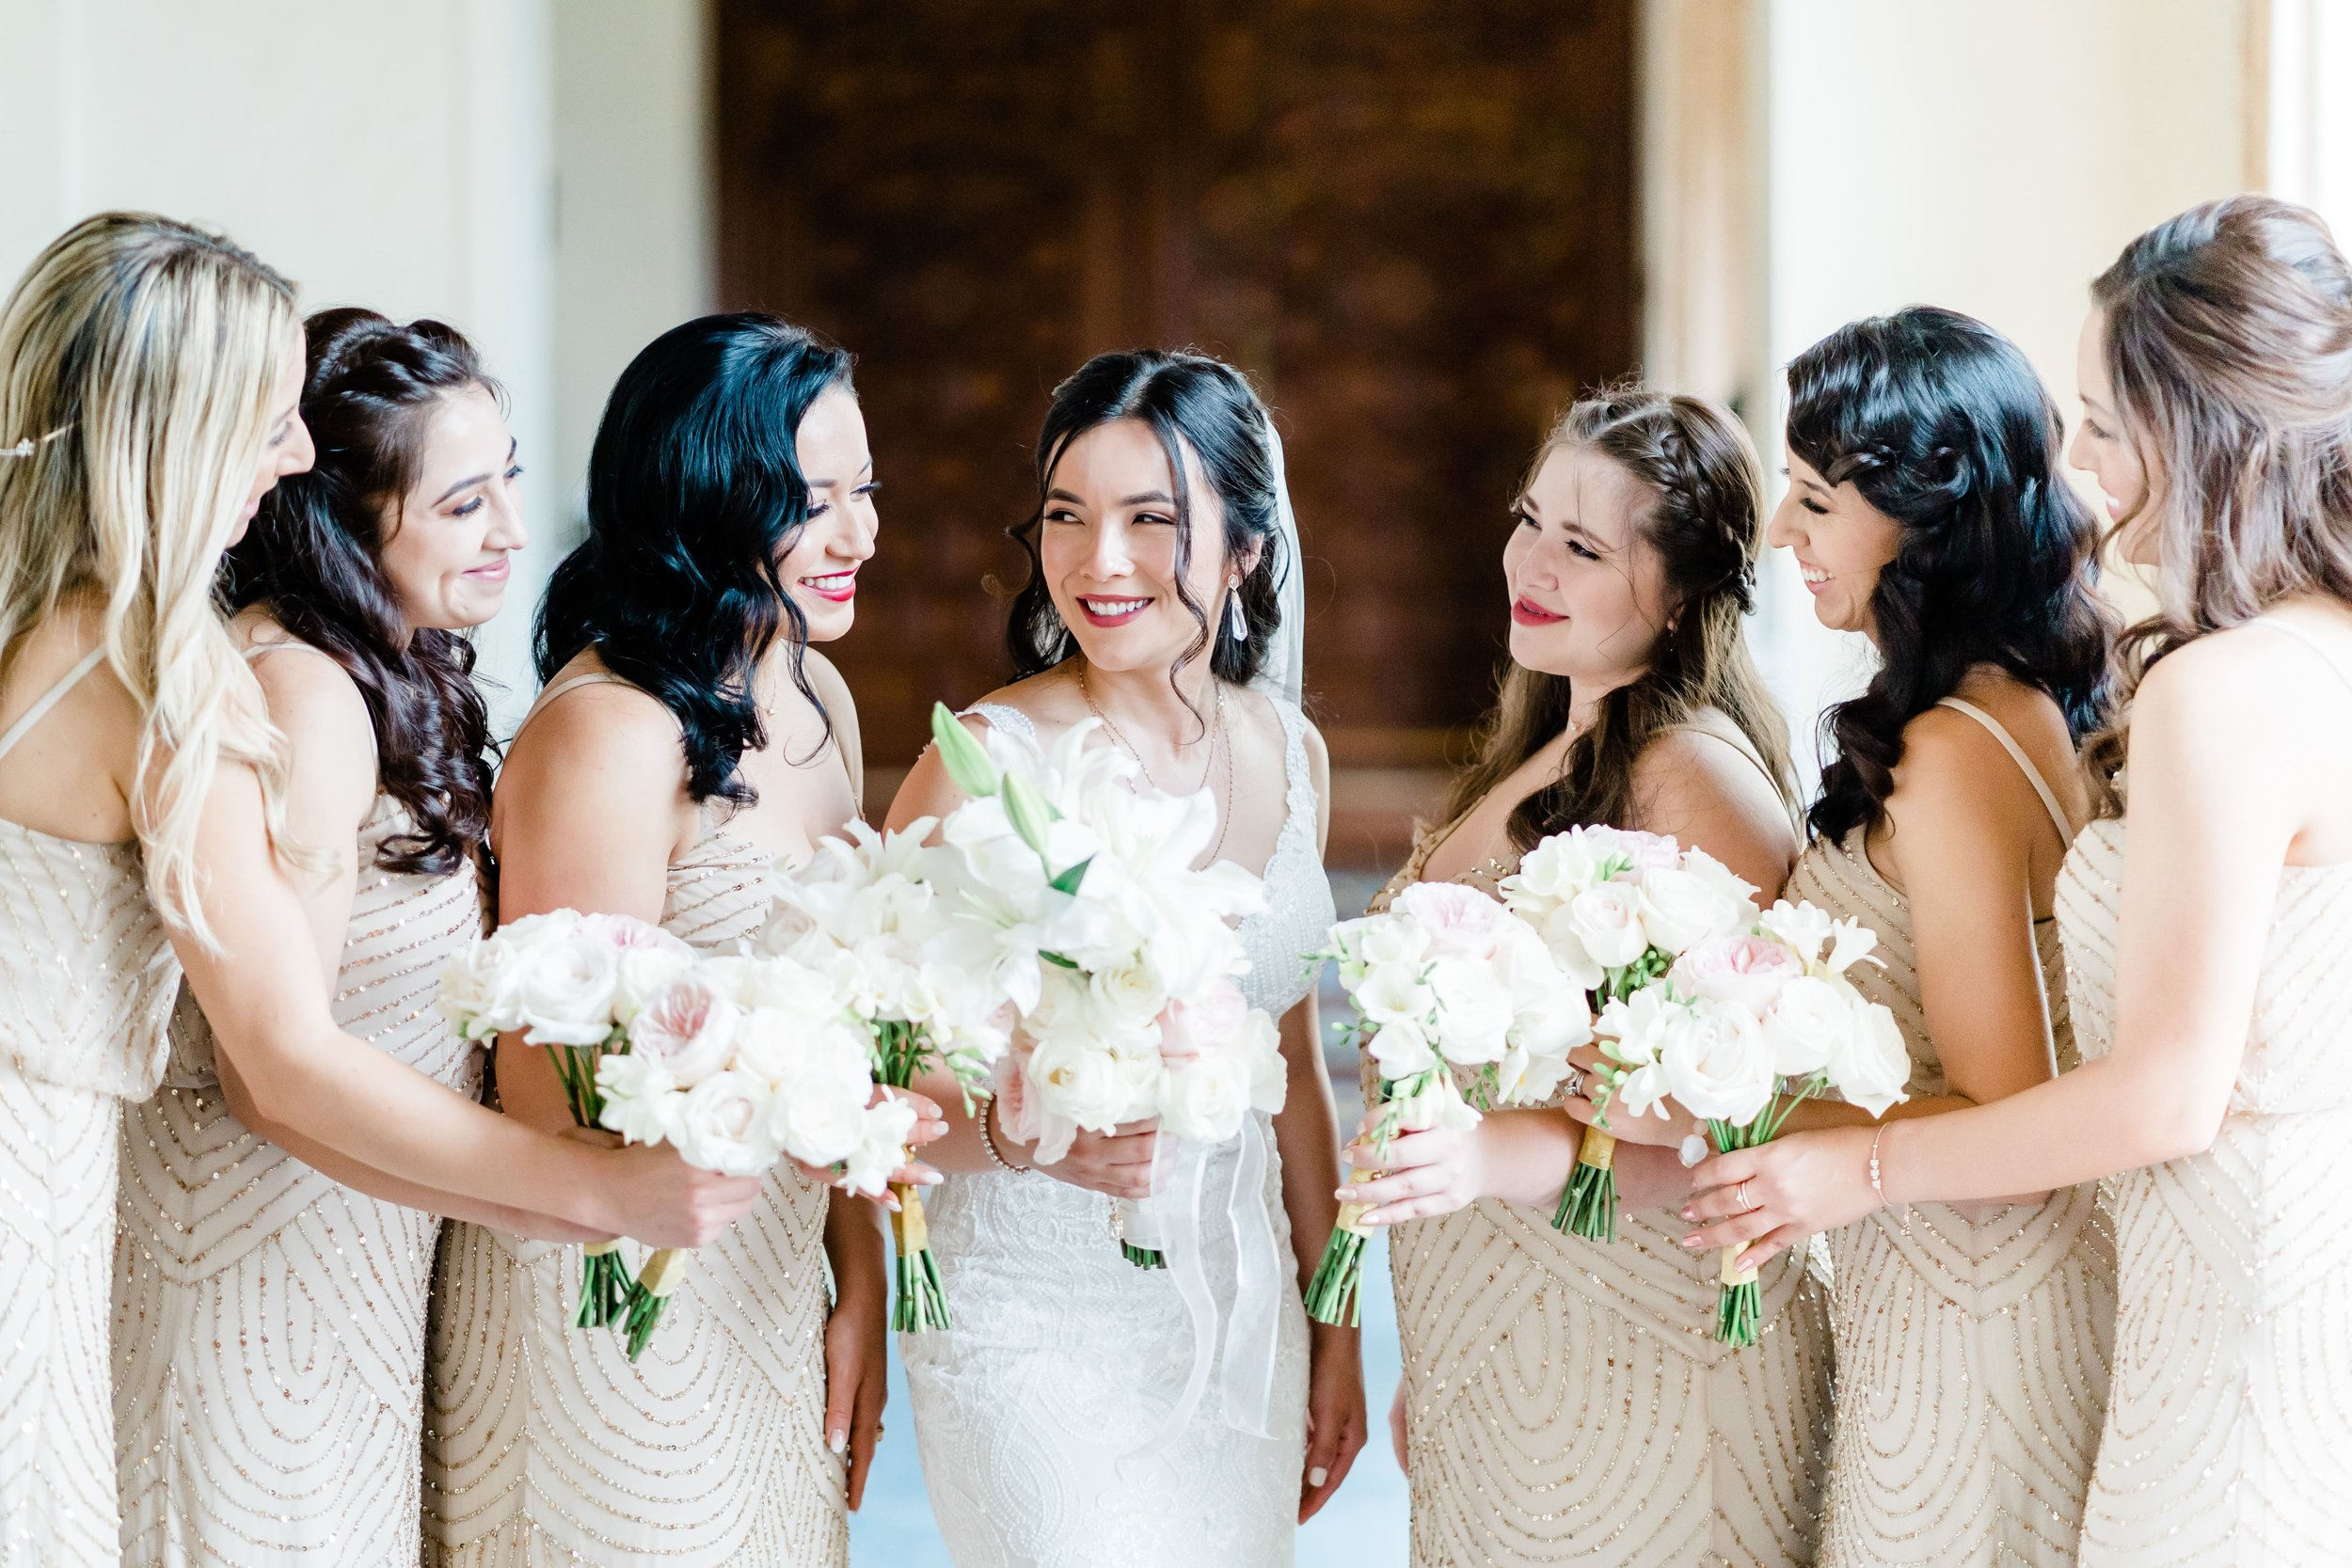 3naval-postgraduate-school-wedding-in-monterey-ca-drew-zavala-photo-bobby-briana-1-min.jpg